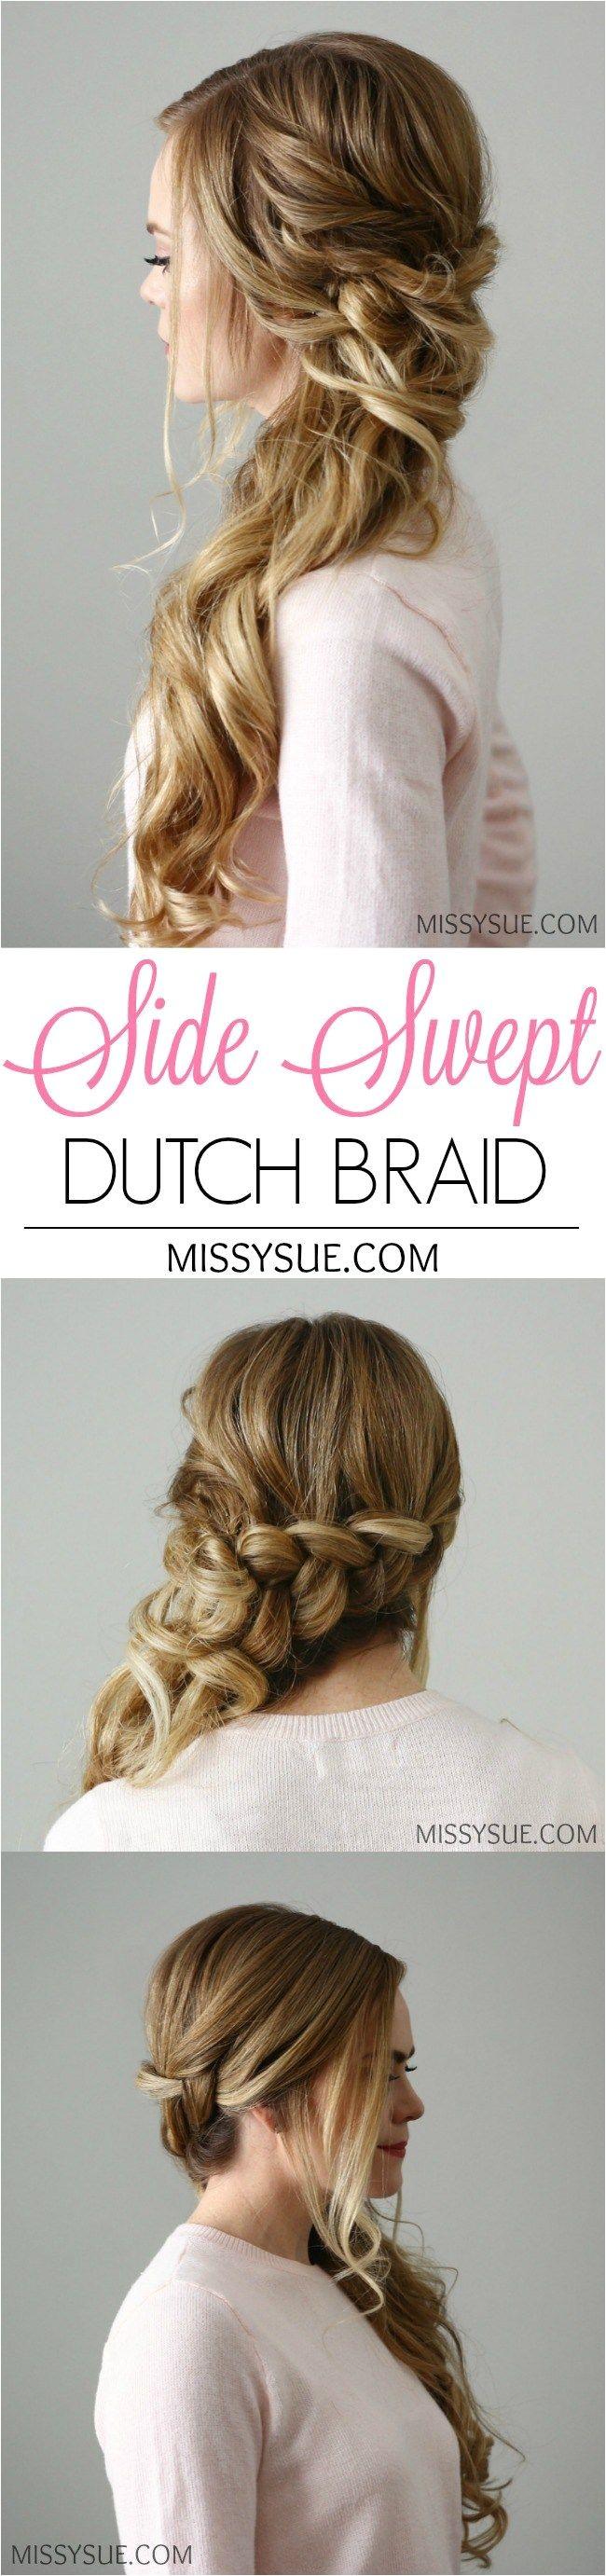 Side Swept Dutch Braid in 2018 Women s World Pinterest